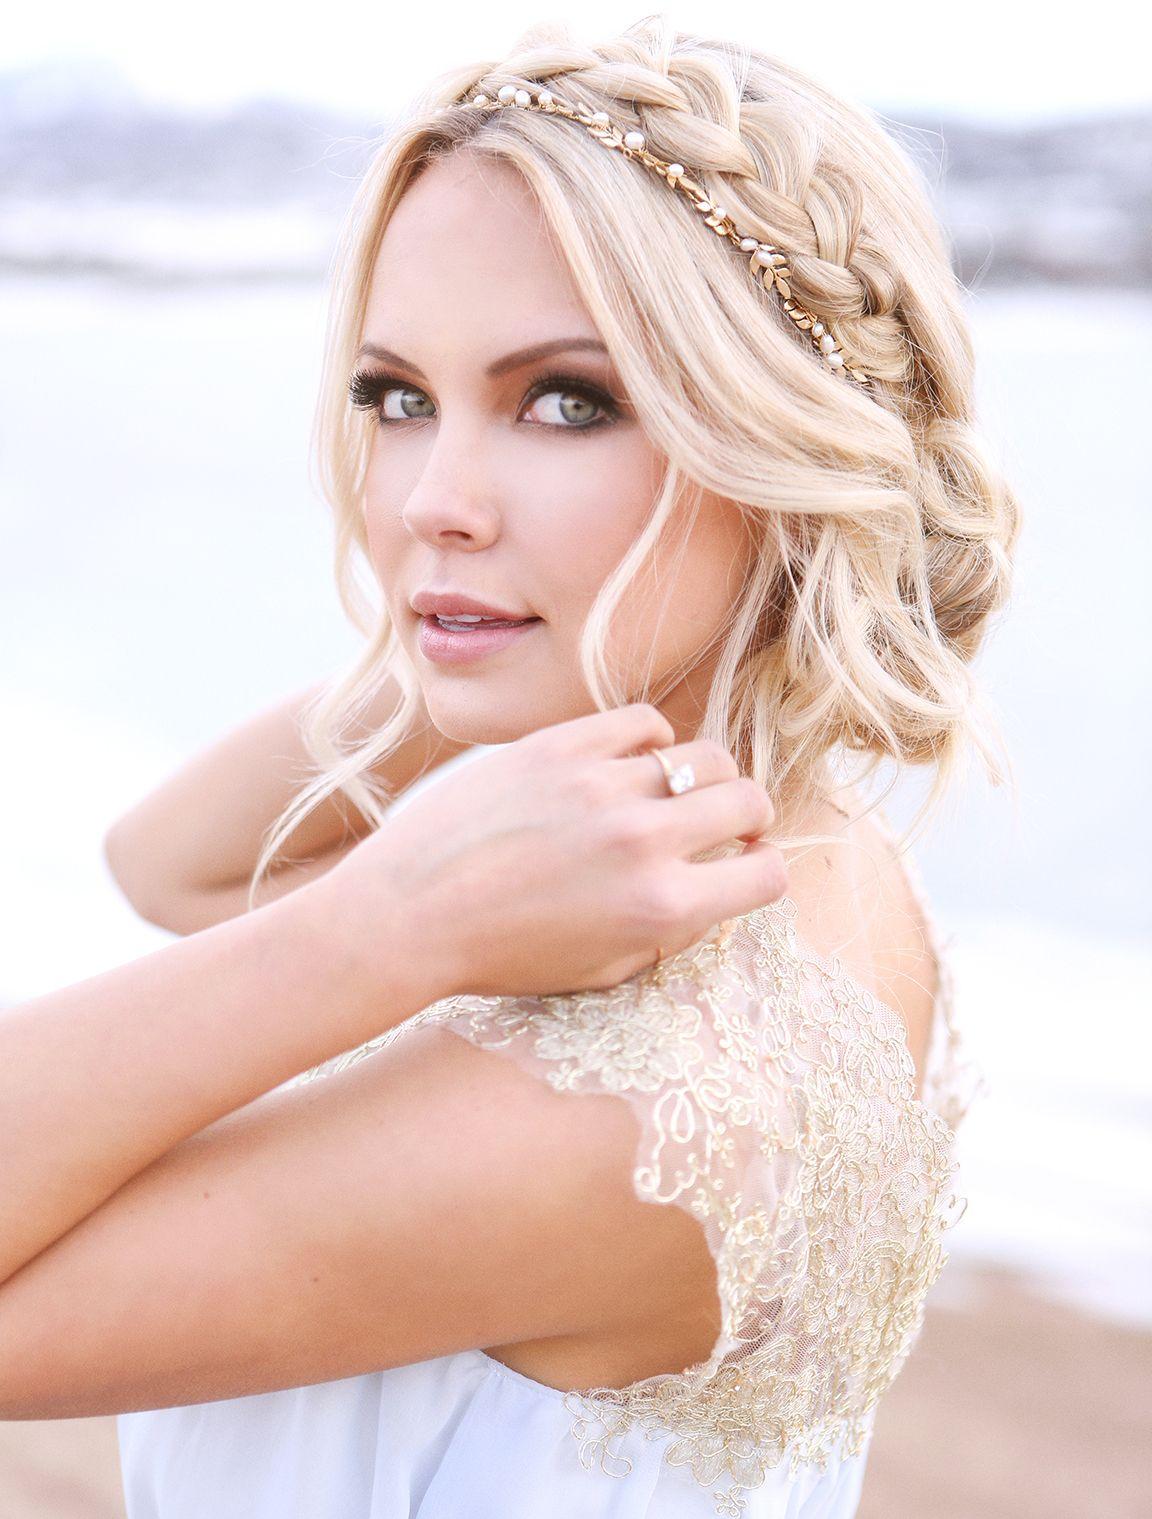 beautiful updo | Beauty | Pinterest | Updo, Hair style and Weddings